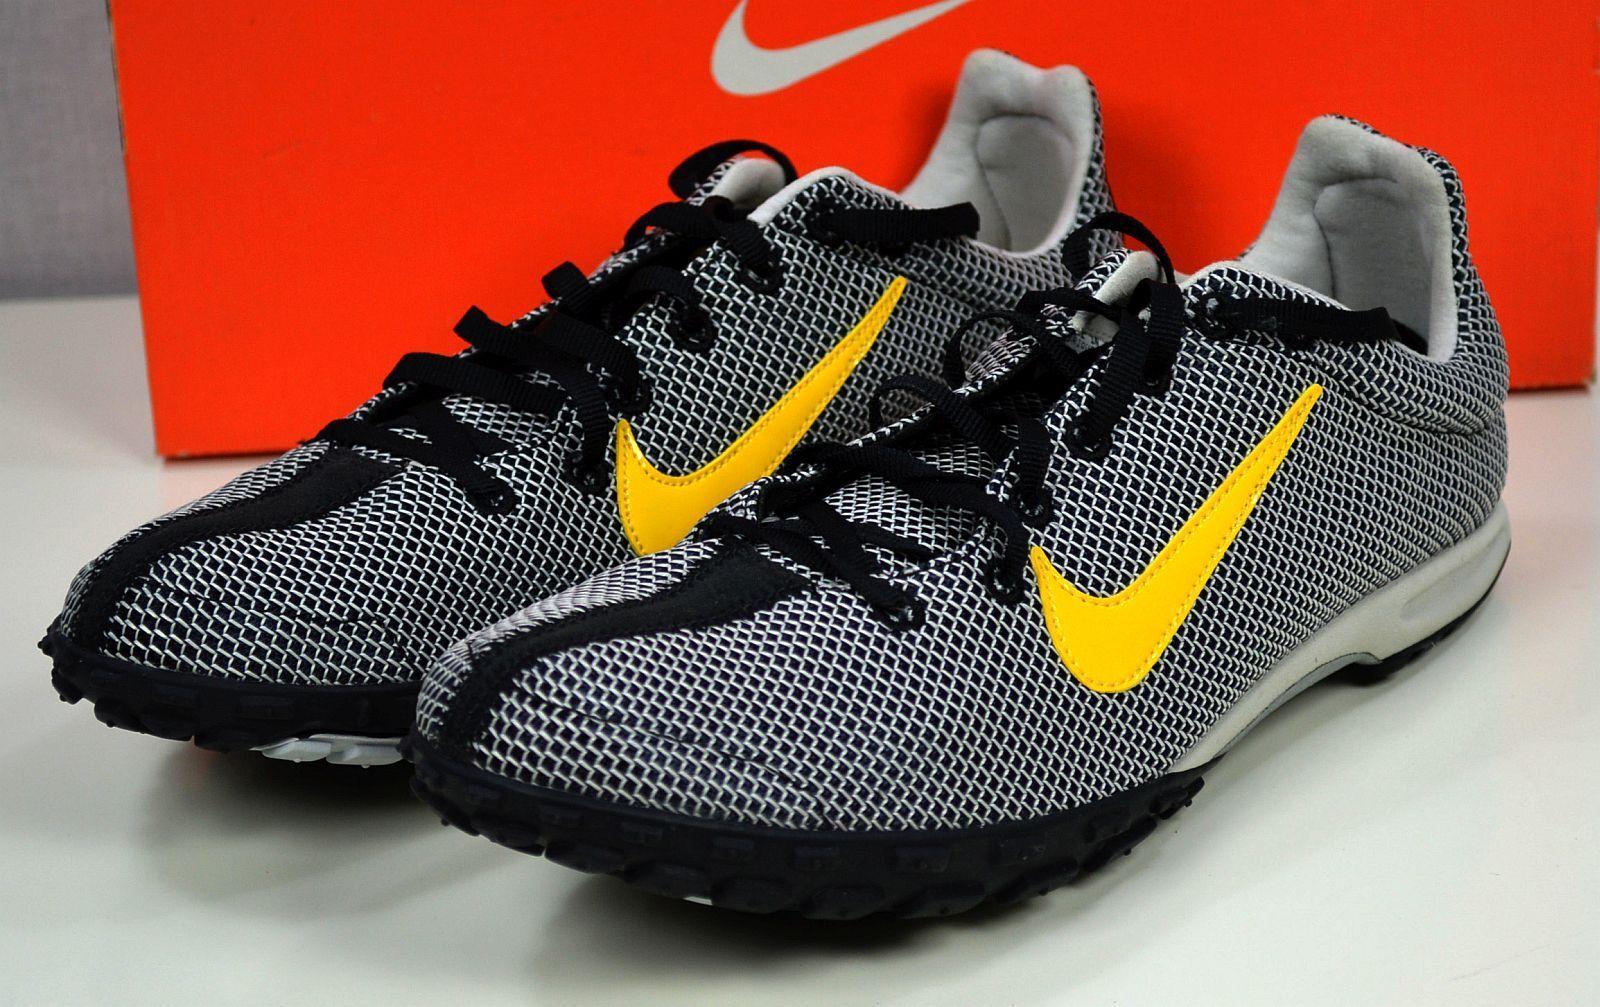 Nike Zoom Waffle XC VII Unisex Track Spike Laufschuhe Sportschuhe sale 13041705